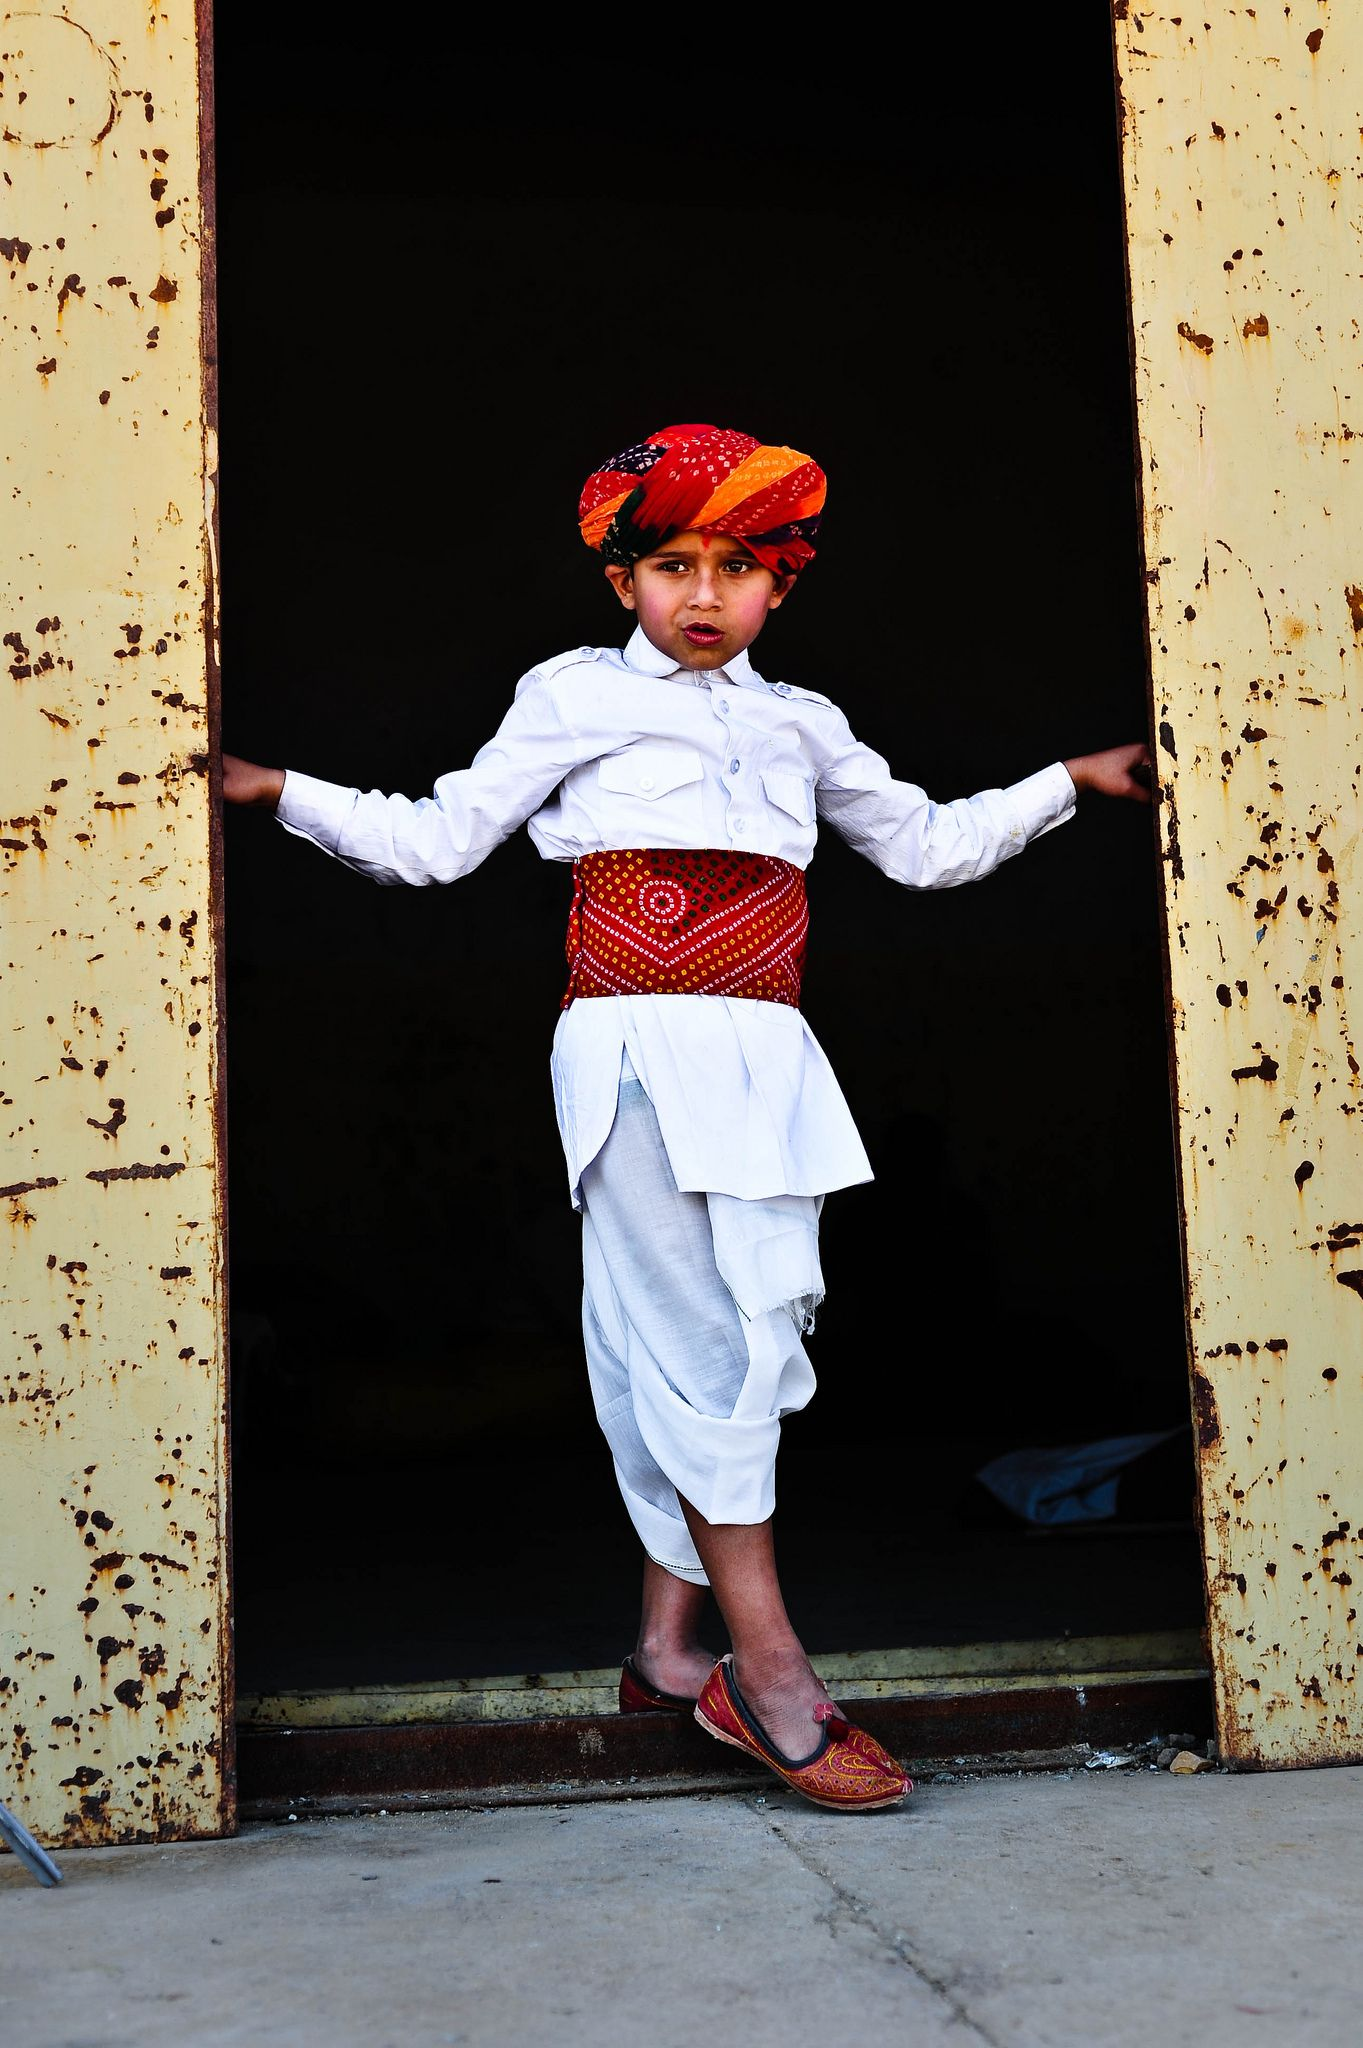 https://flic.kr/p/cYtewA   Jaisalmer, India, 2011   Boy at the the Desert Festival in Jaisalmer, India.